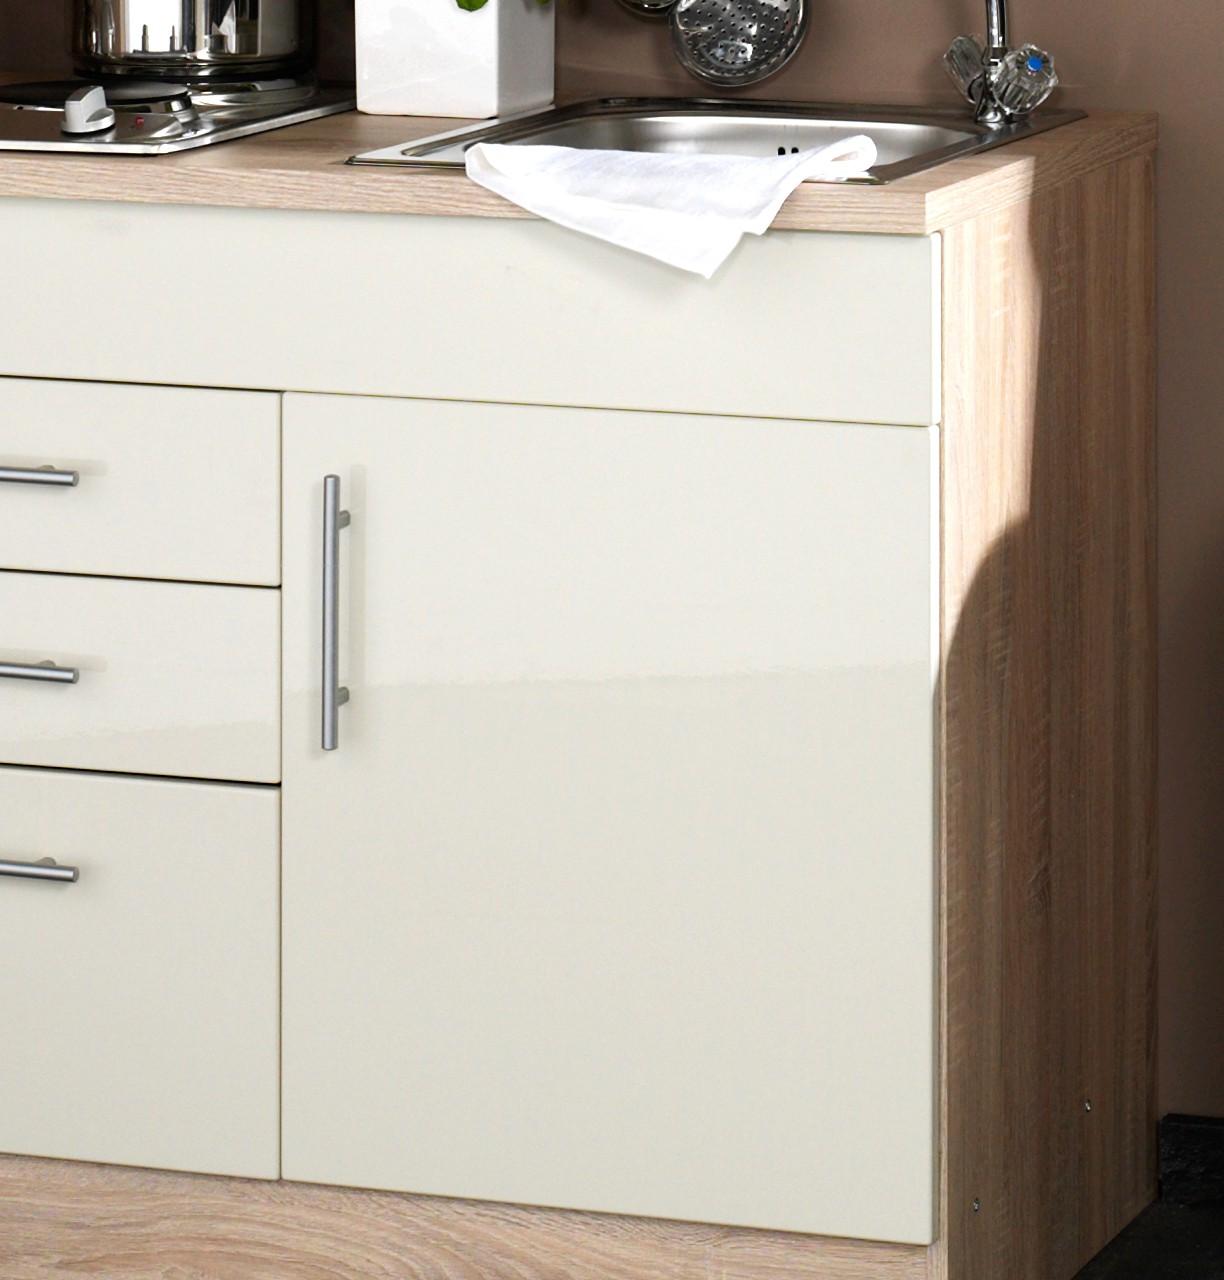 singlek che berlin breite 160 cm hochglanz creme eiche sonoma k che singlek chen. Black Bedroom Furniture Sets. Home Design Ideas